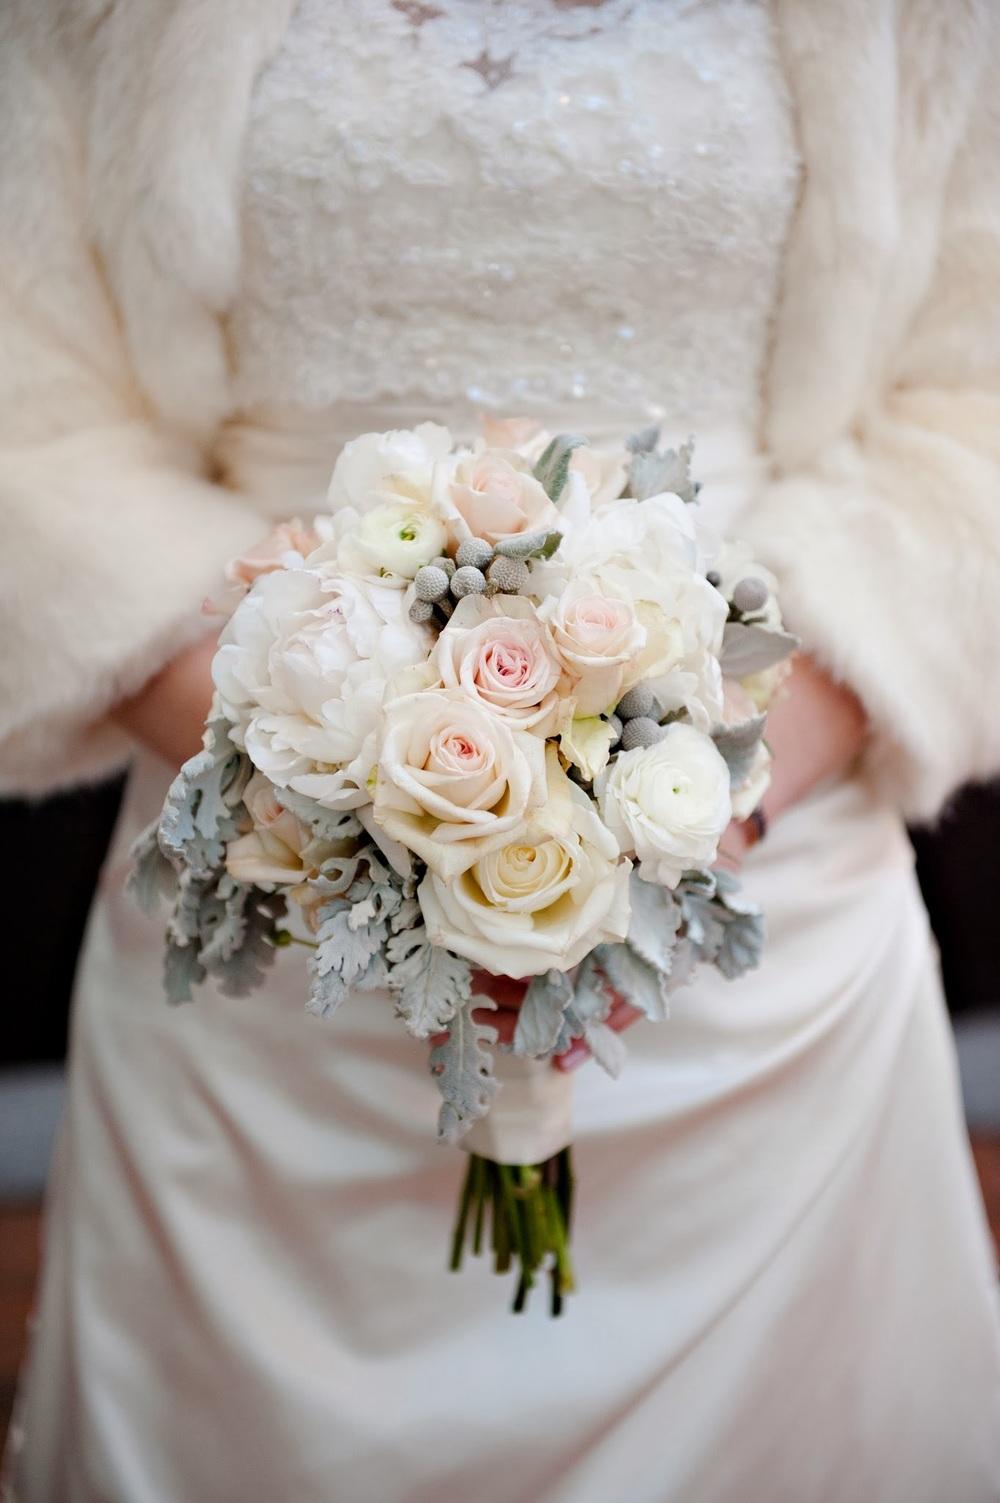 FlowerKiosk_WeddingLookbook_075.jpg